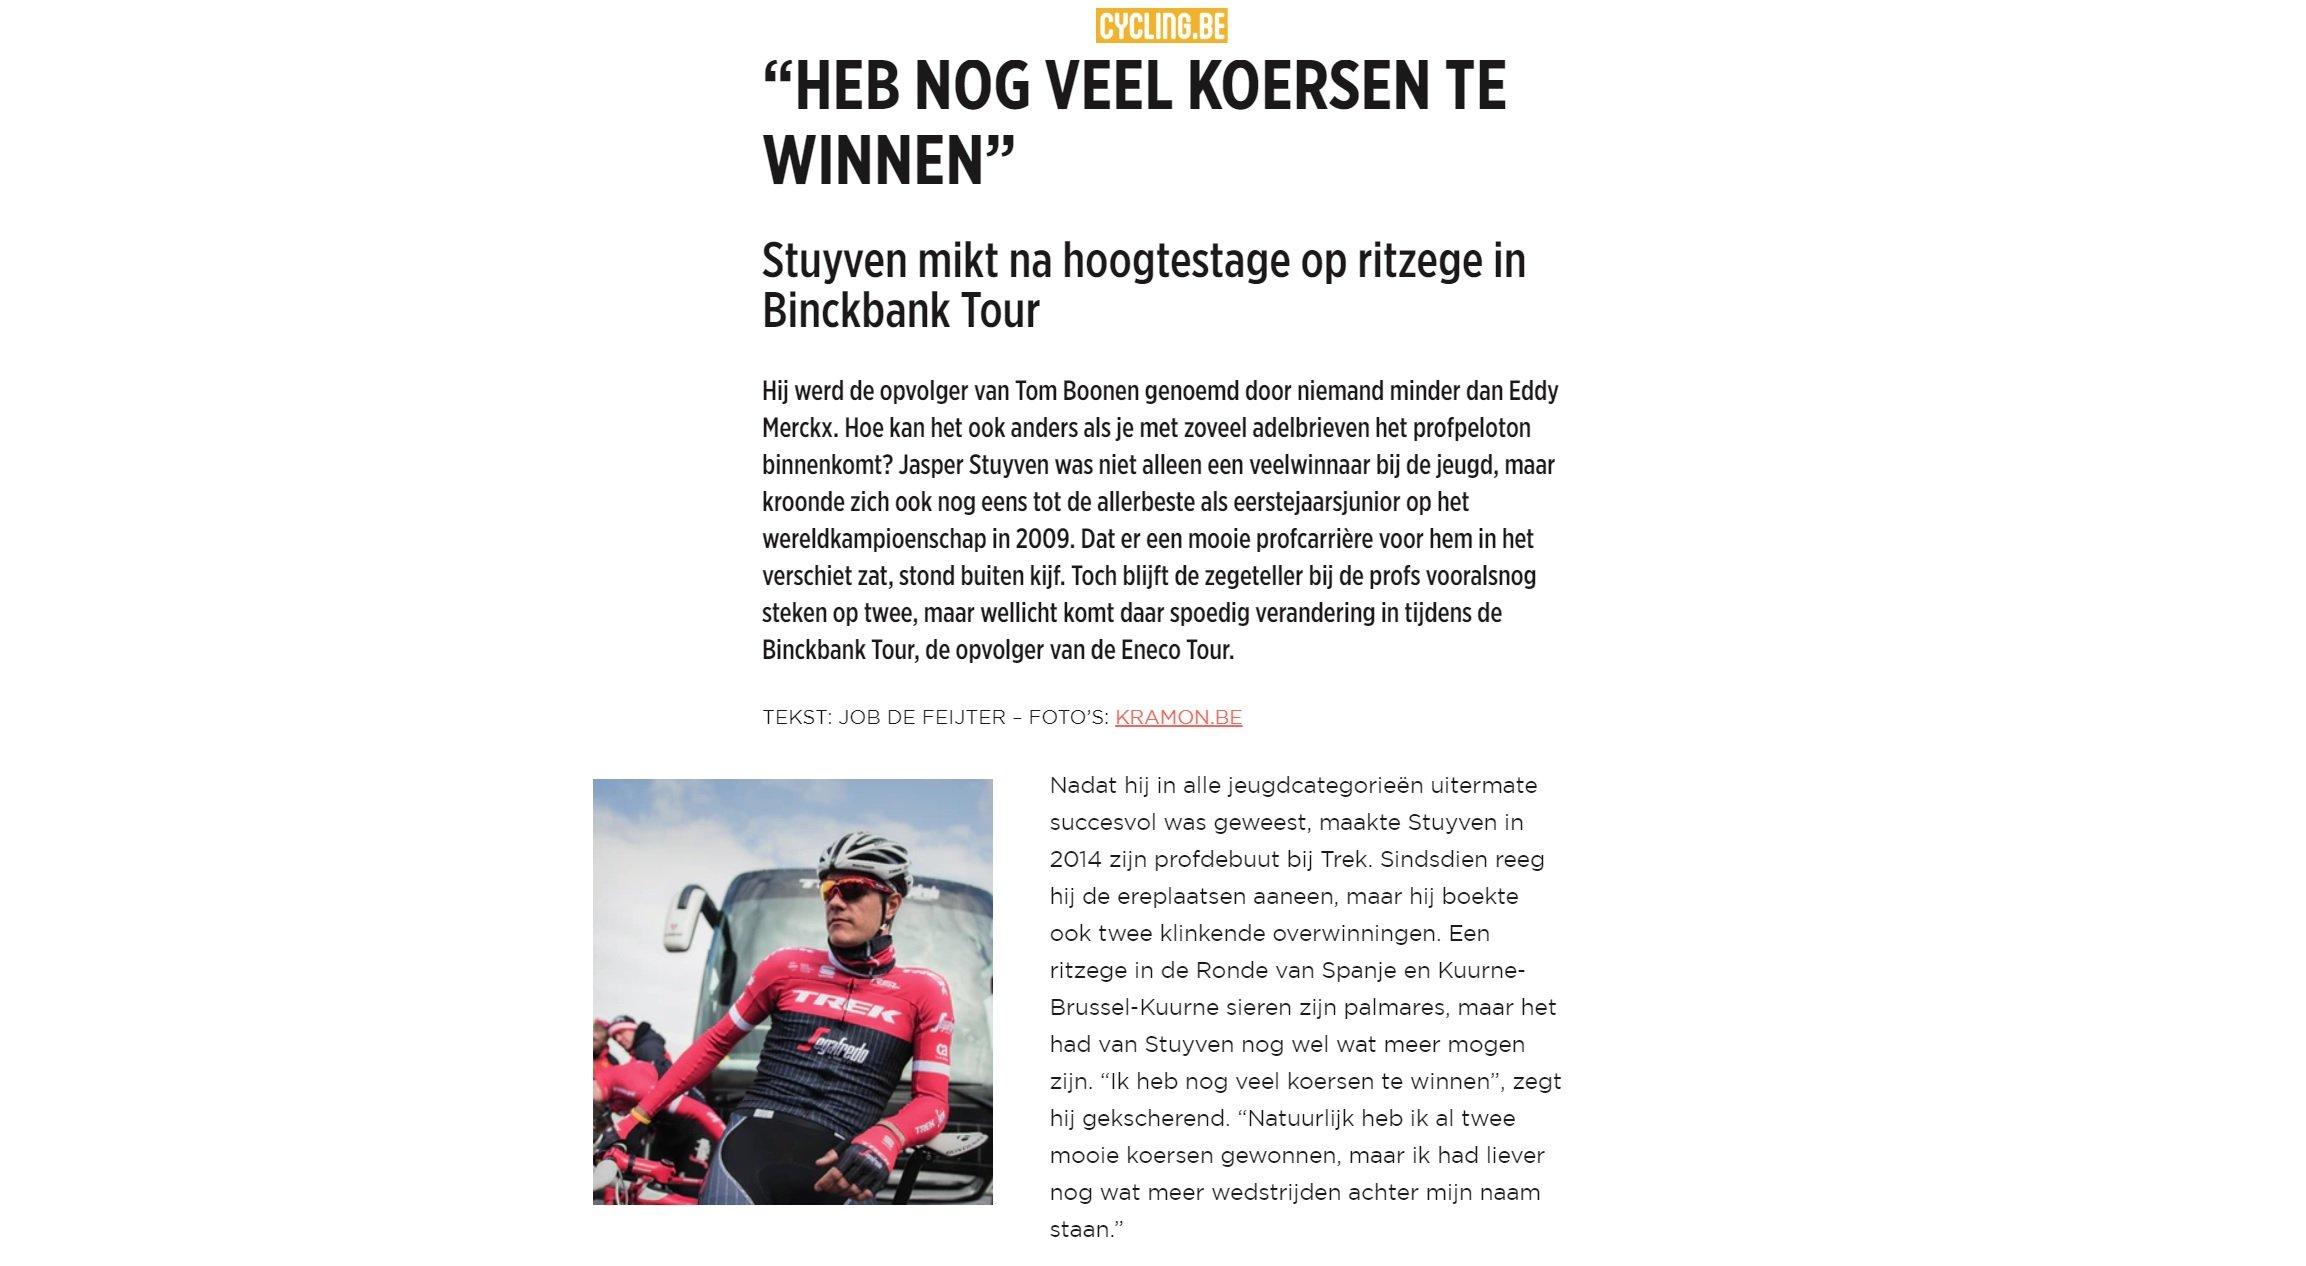 Copywriting Cycling.be